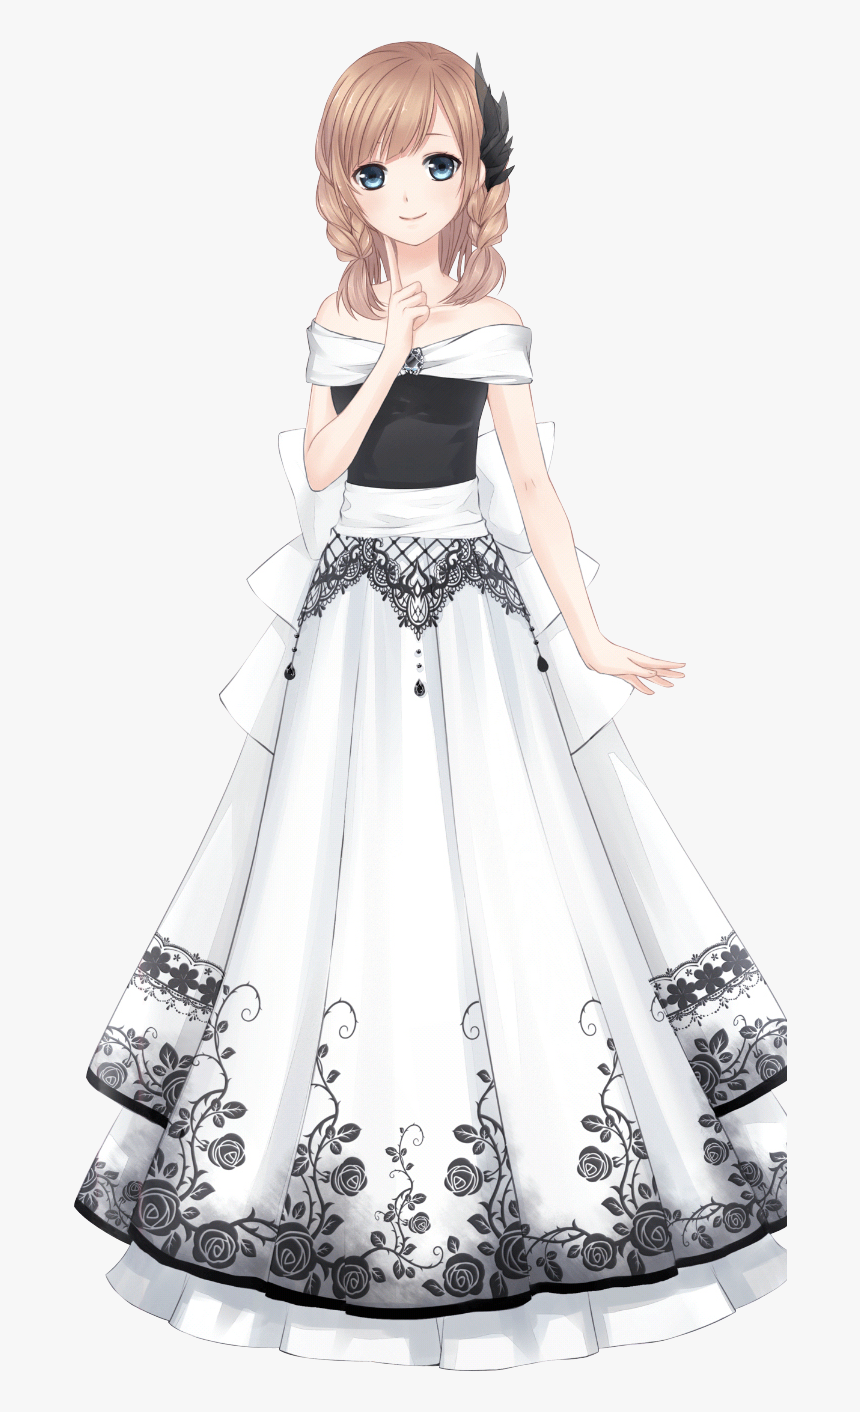 Anime Girl In Dress